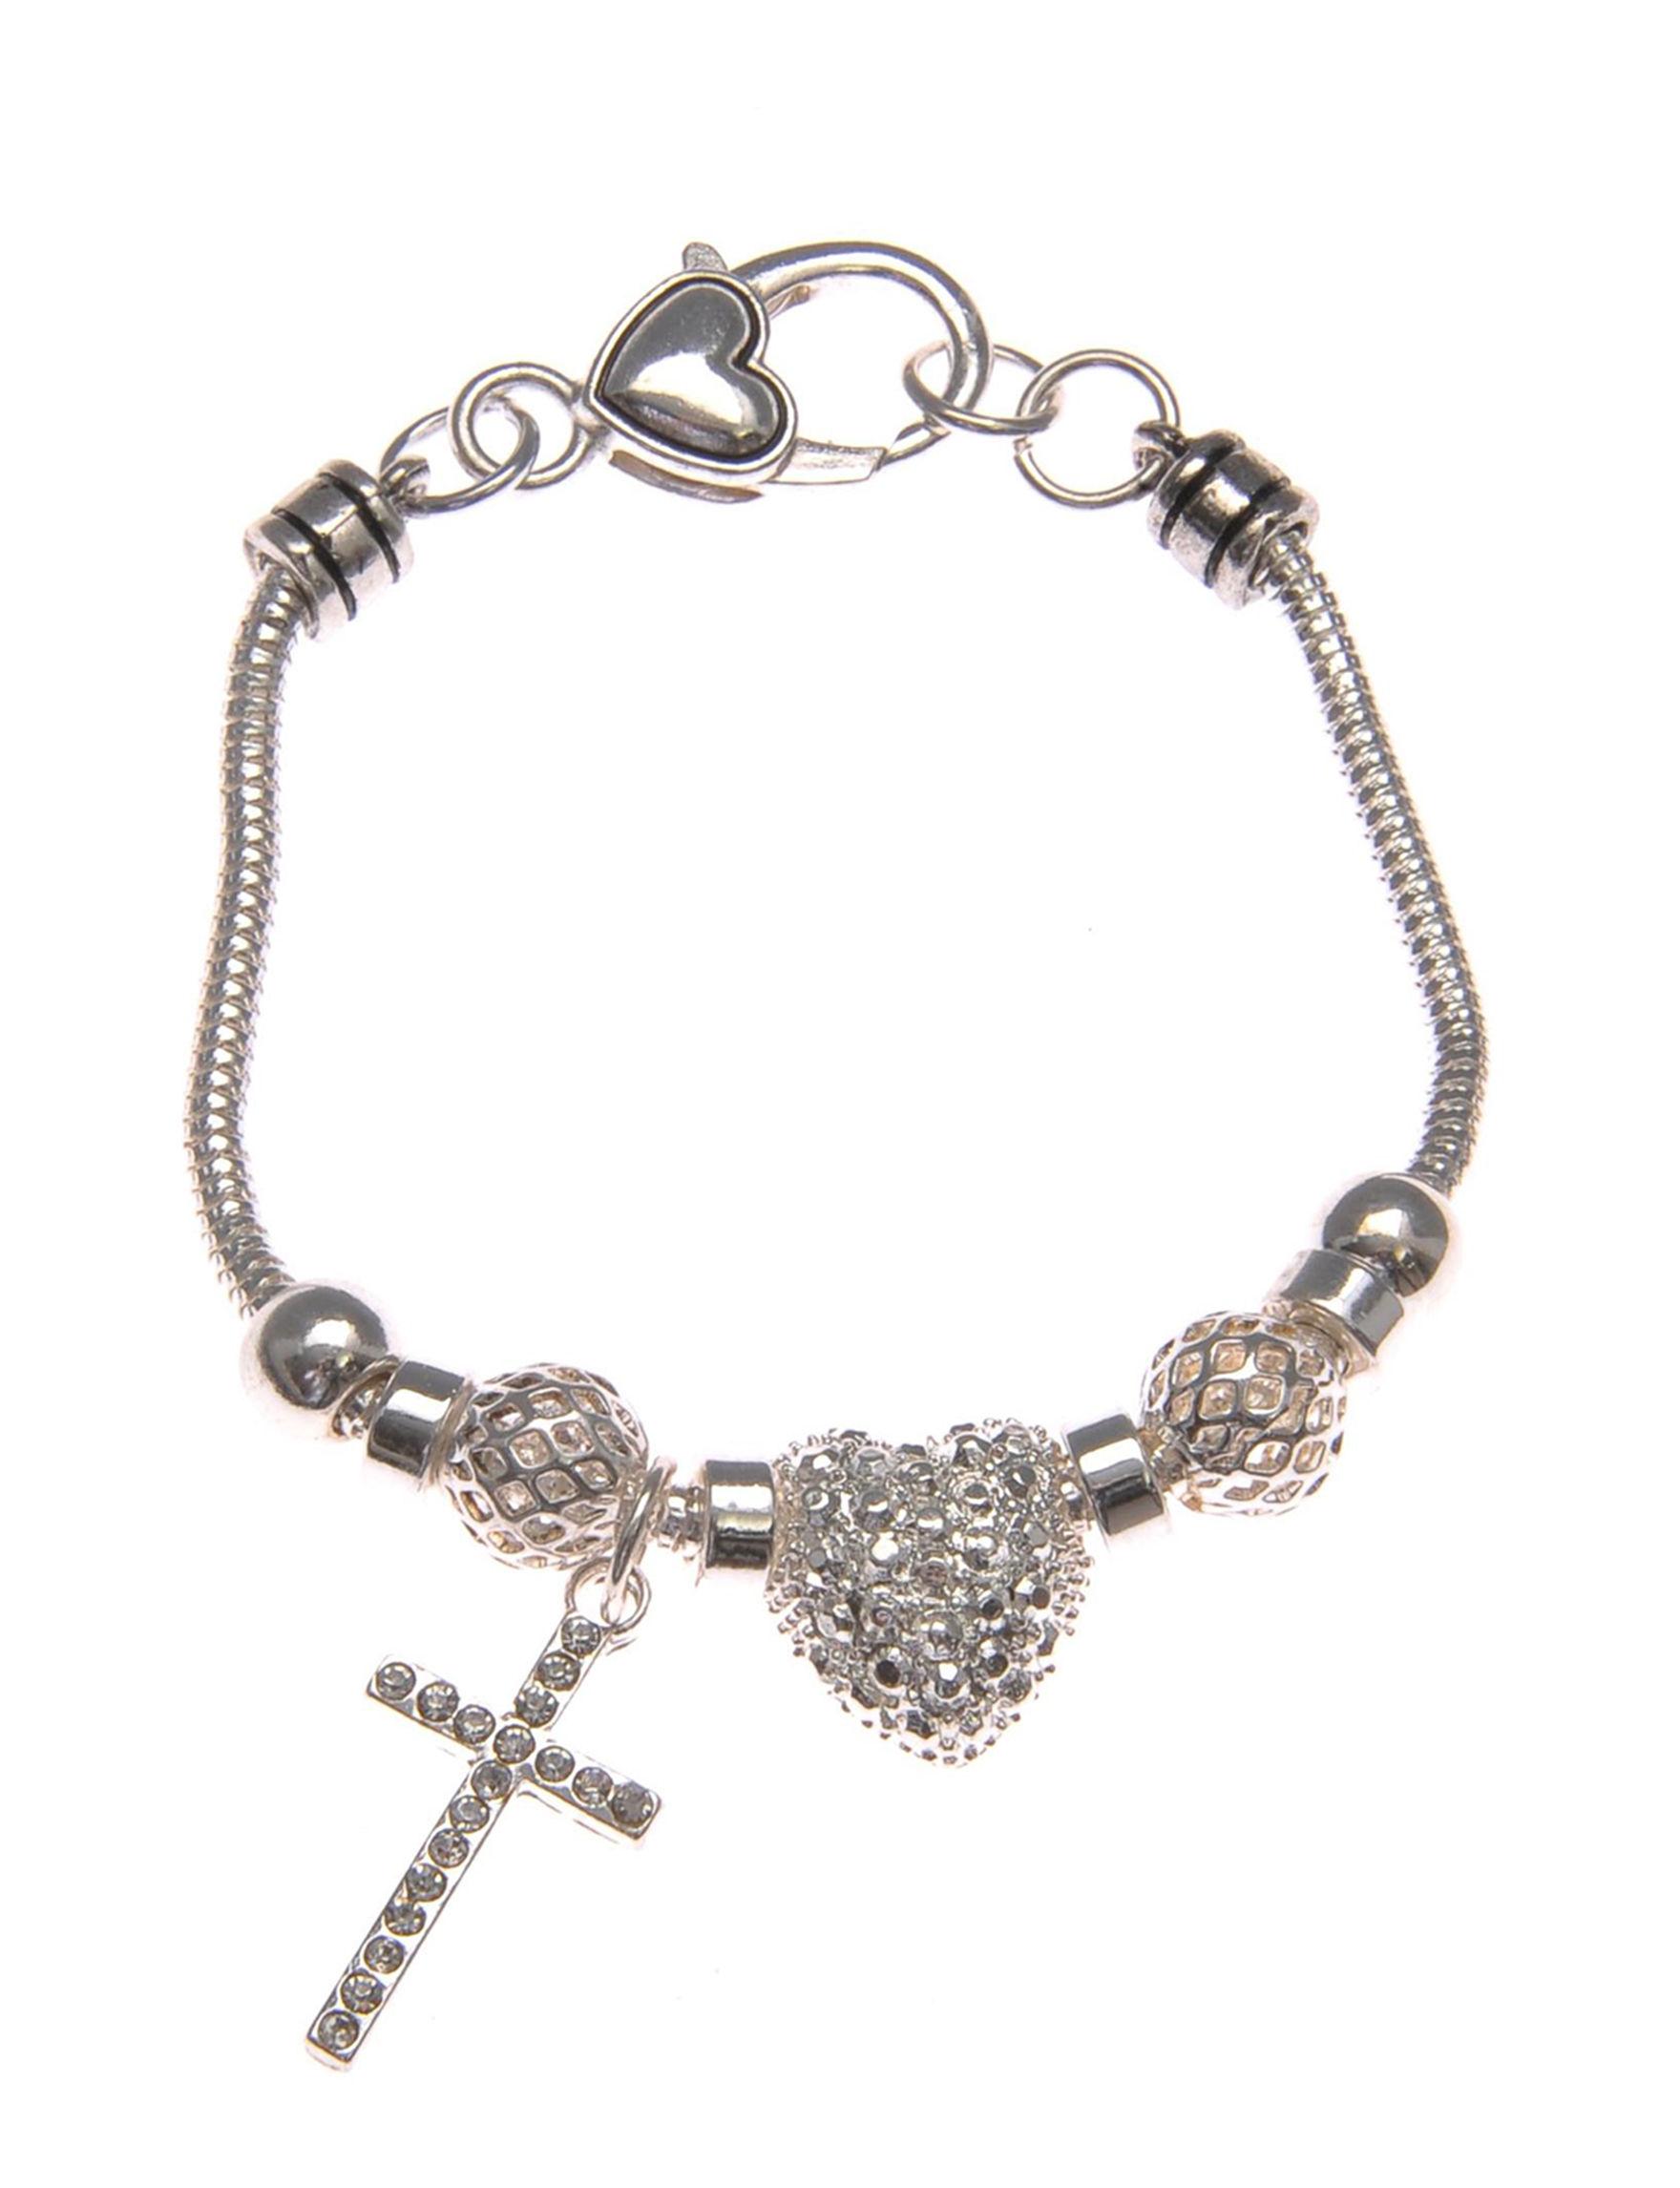 L & J Silver Bracelets Fashion Jewelry